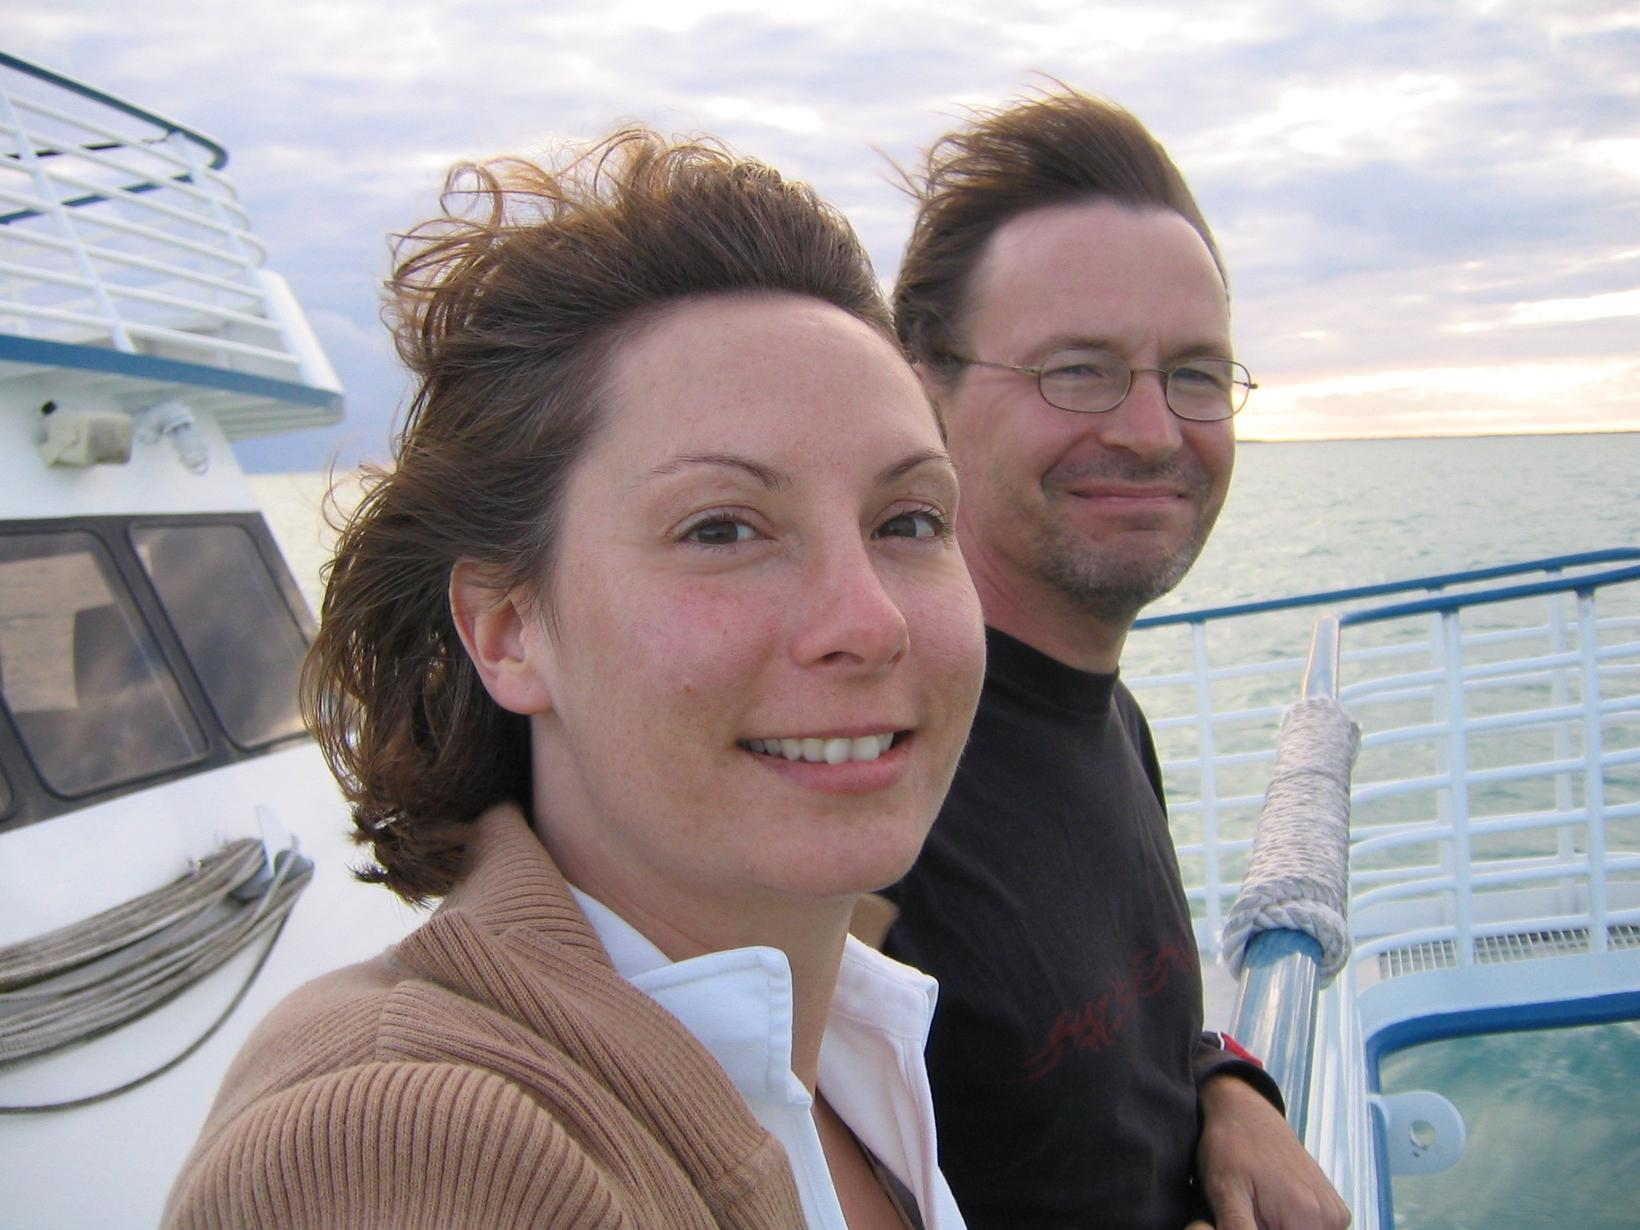 Cindy & Mark from Kelowna, British Columbia, Canada